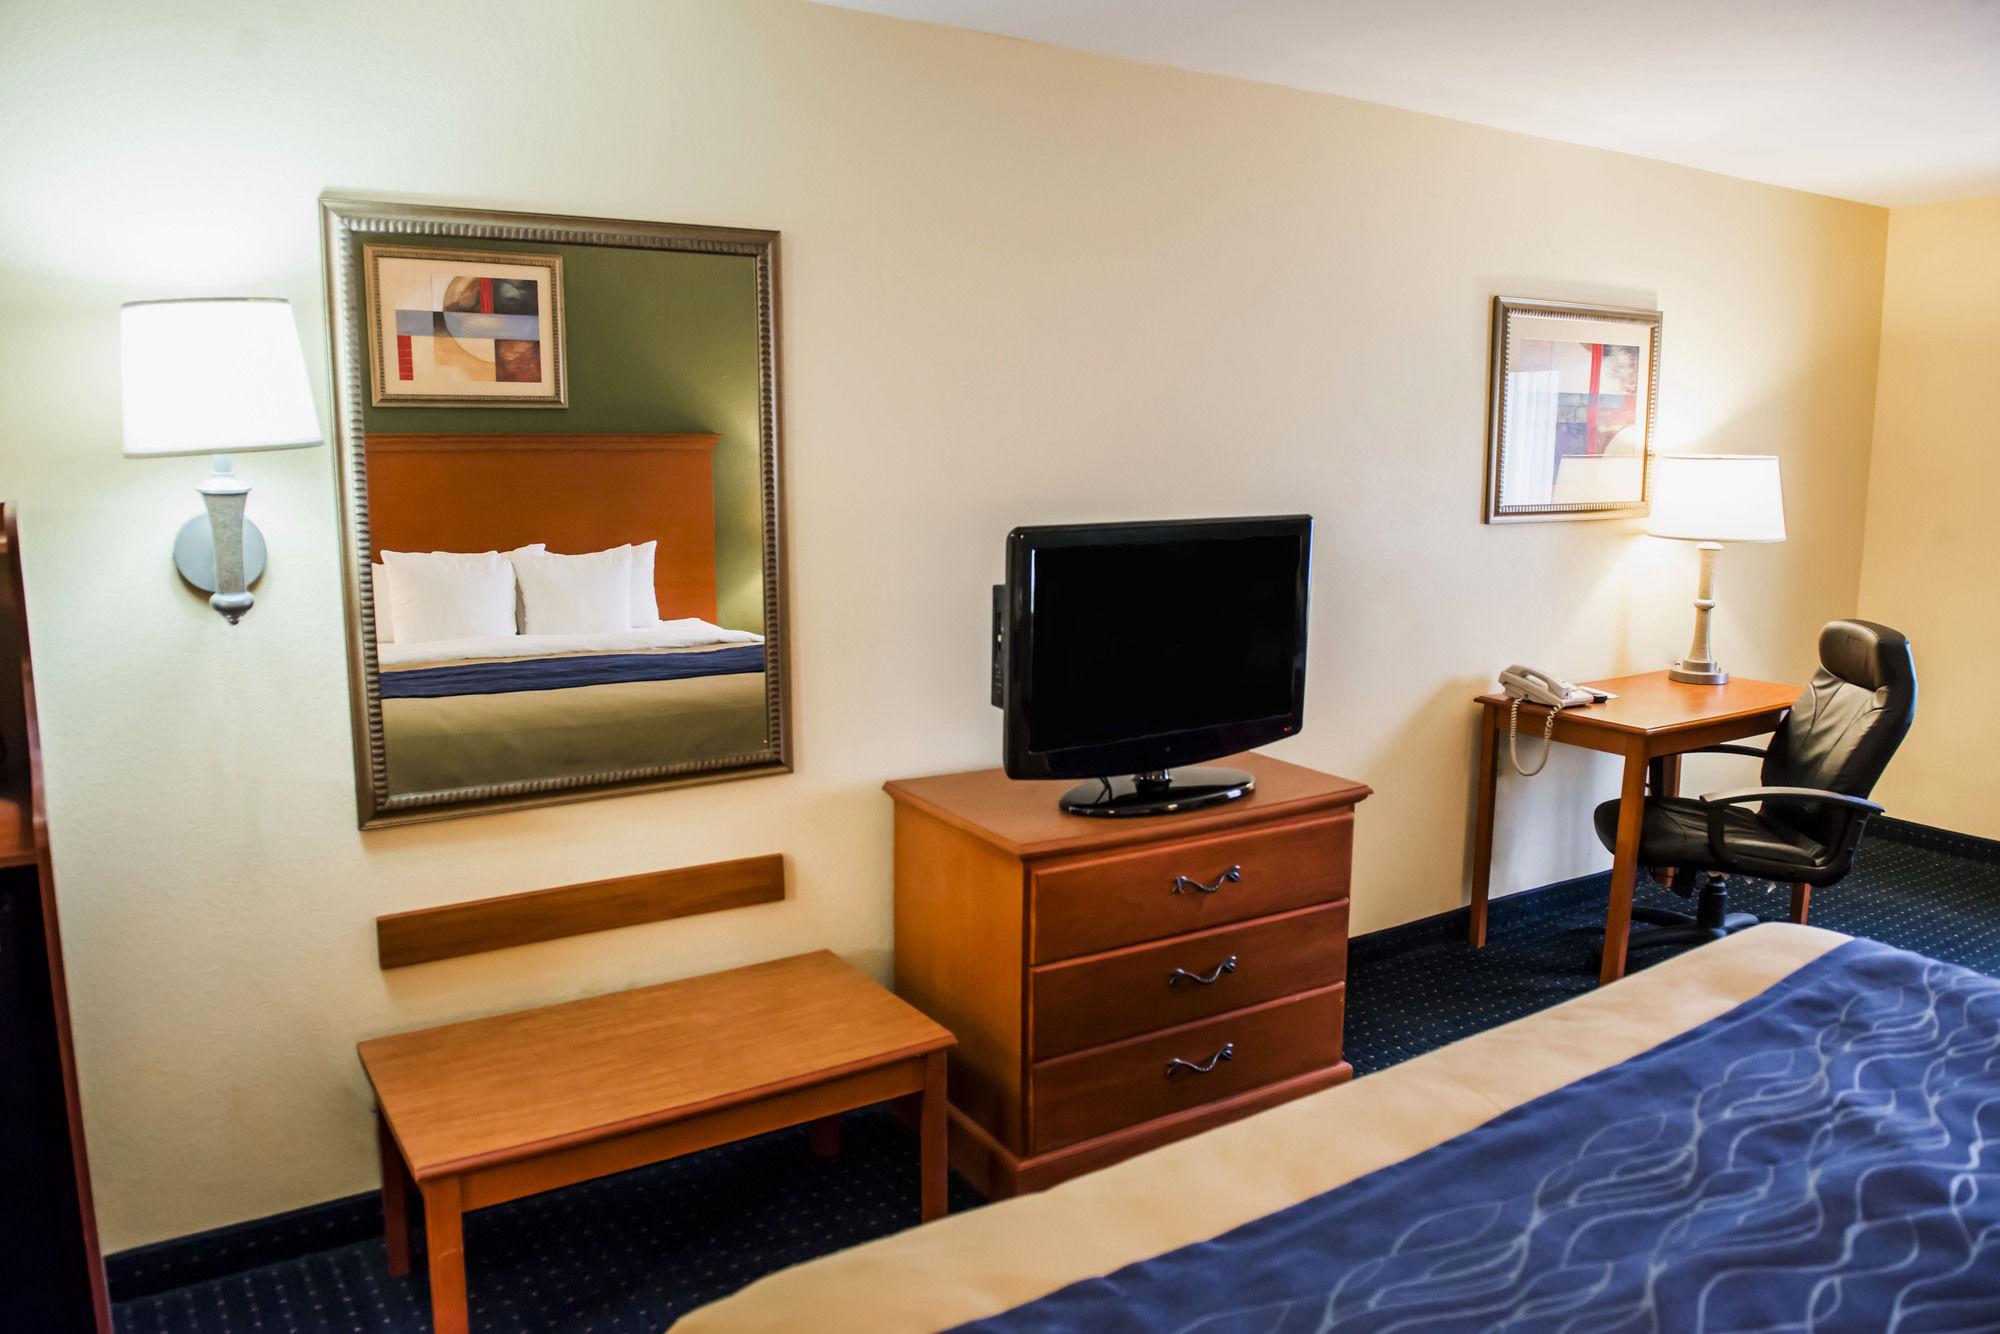 Comfort Inn & Suites in Chipley, FL